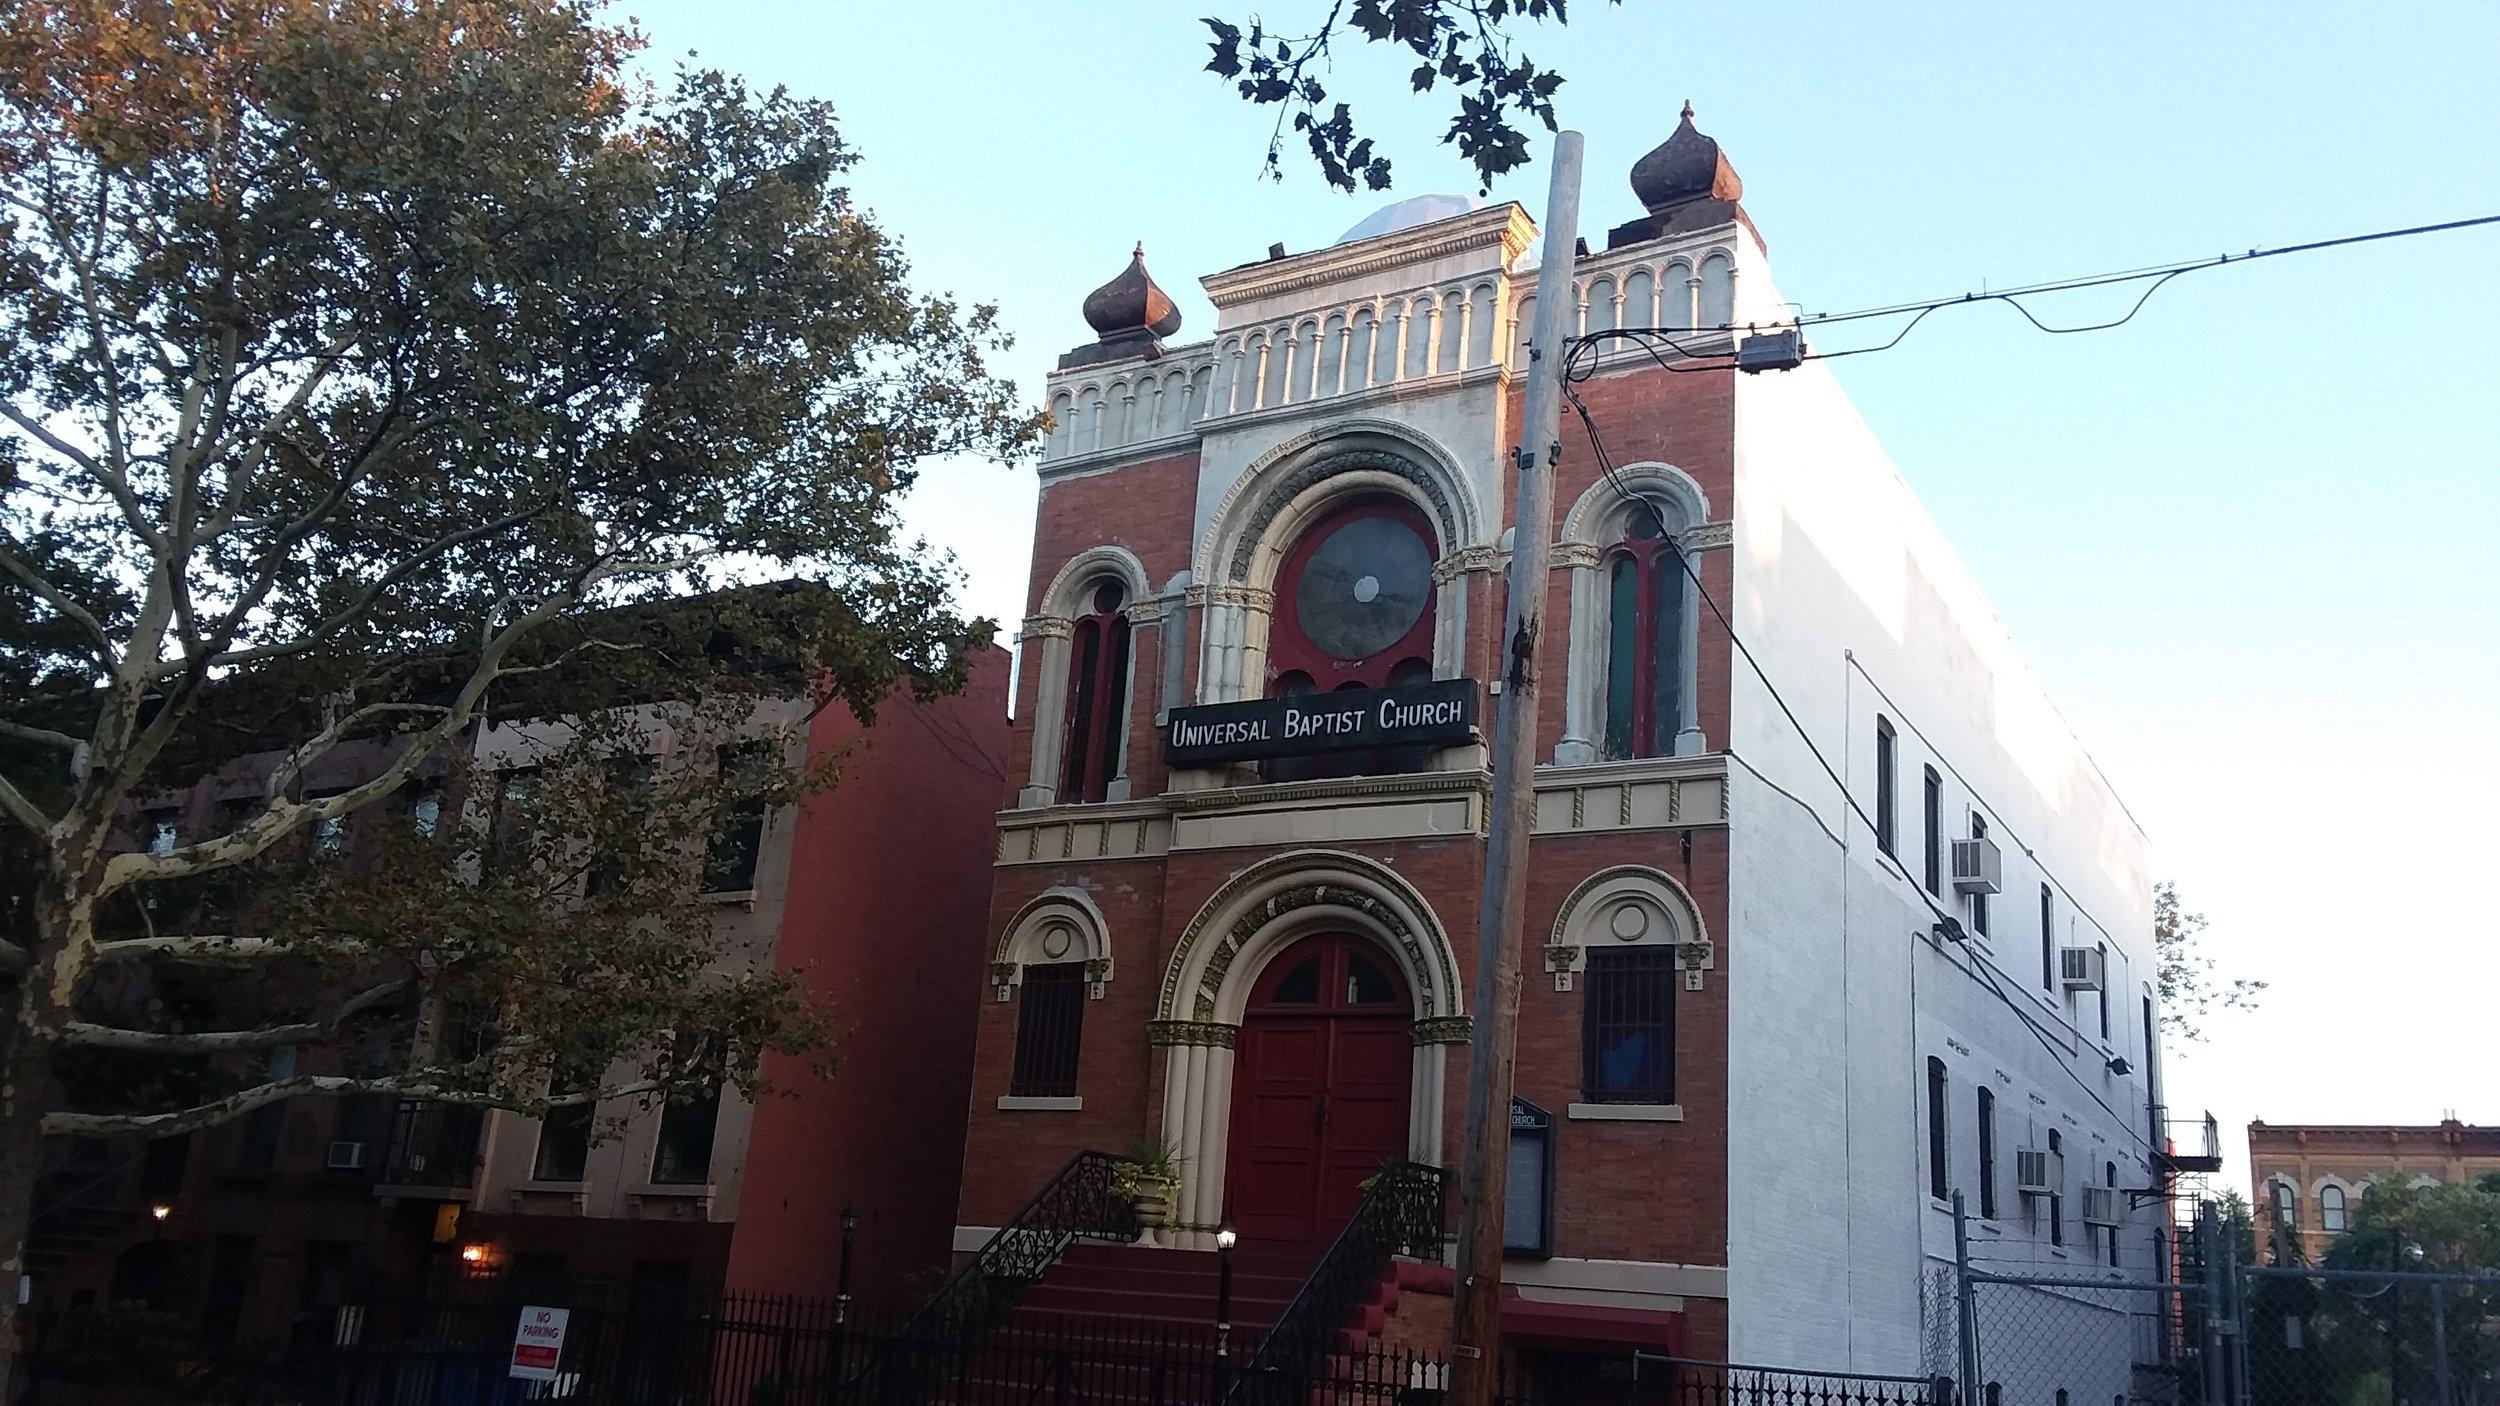 742 Jefferson Ave., Brooklyn, NY. Photo: Darryl Montgomery.